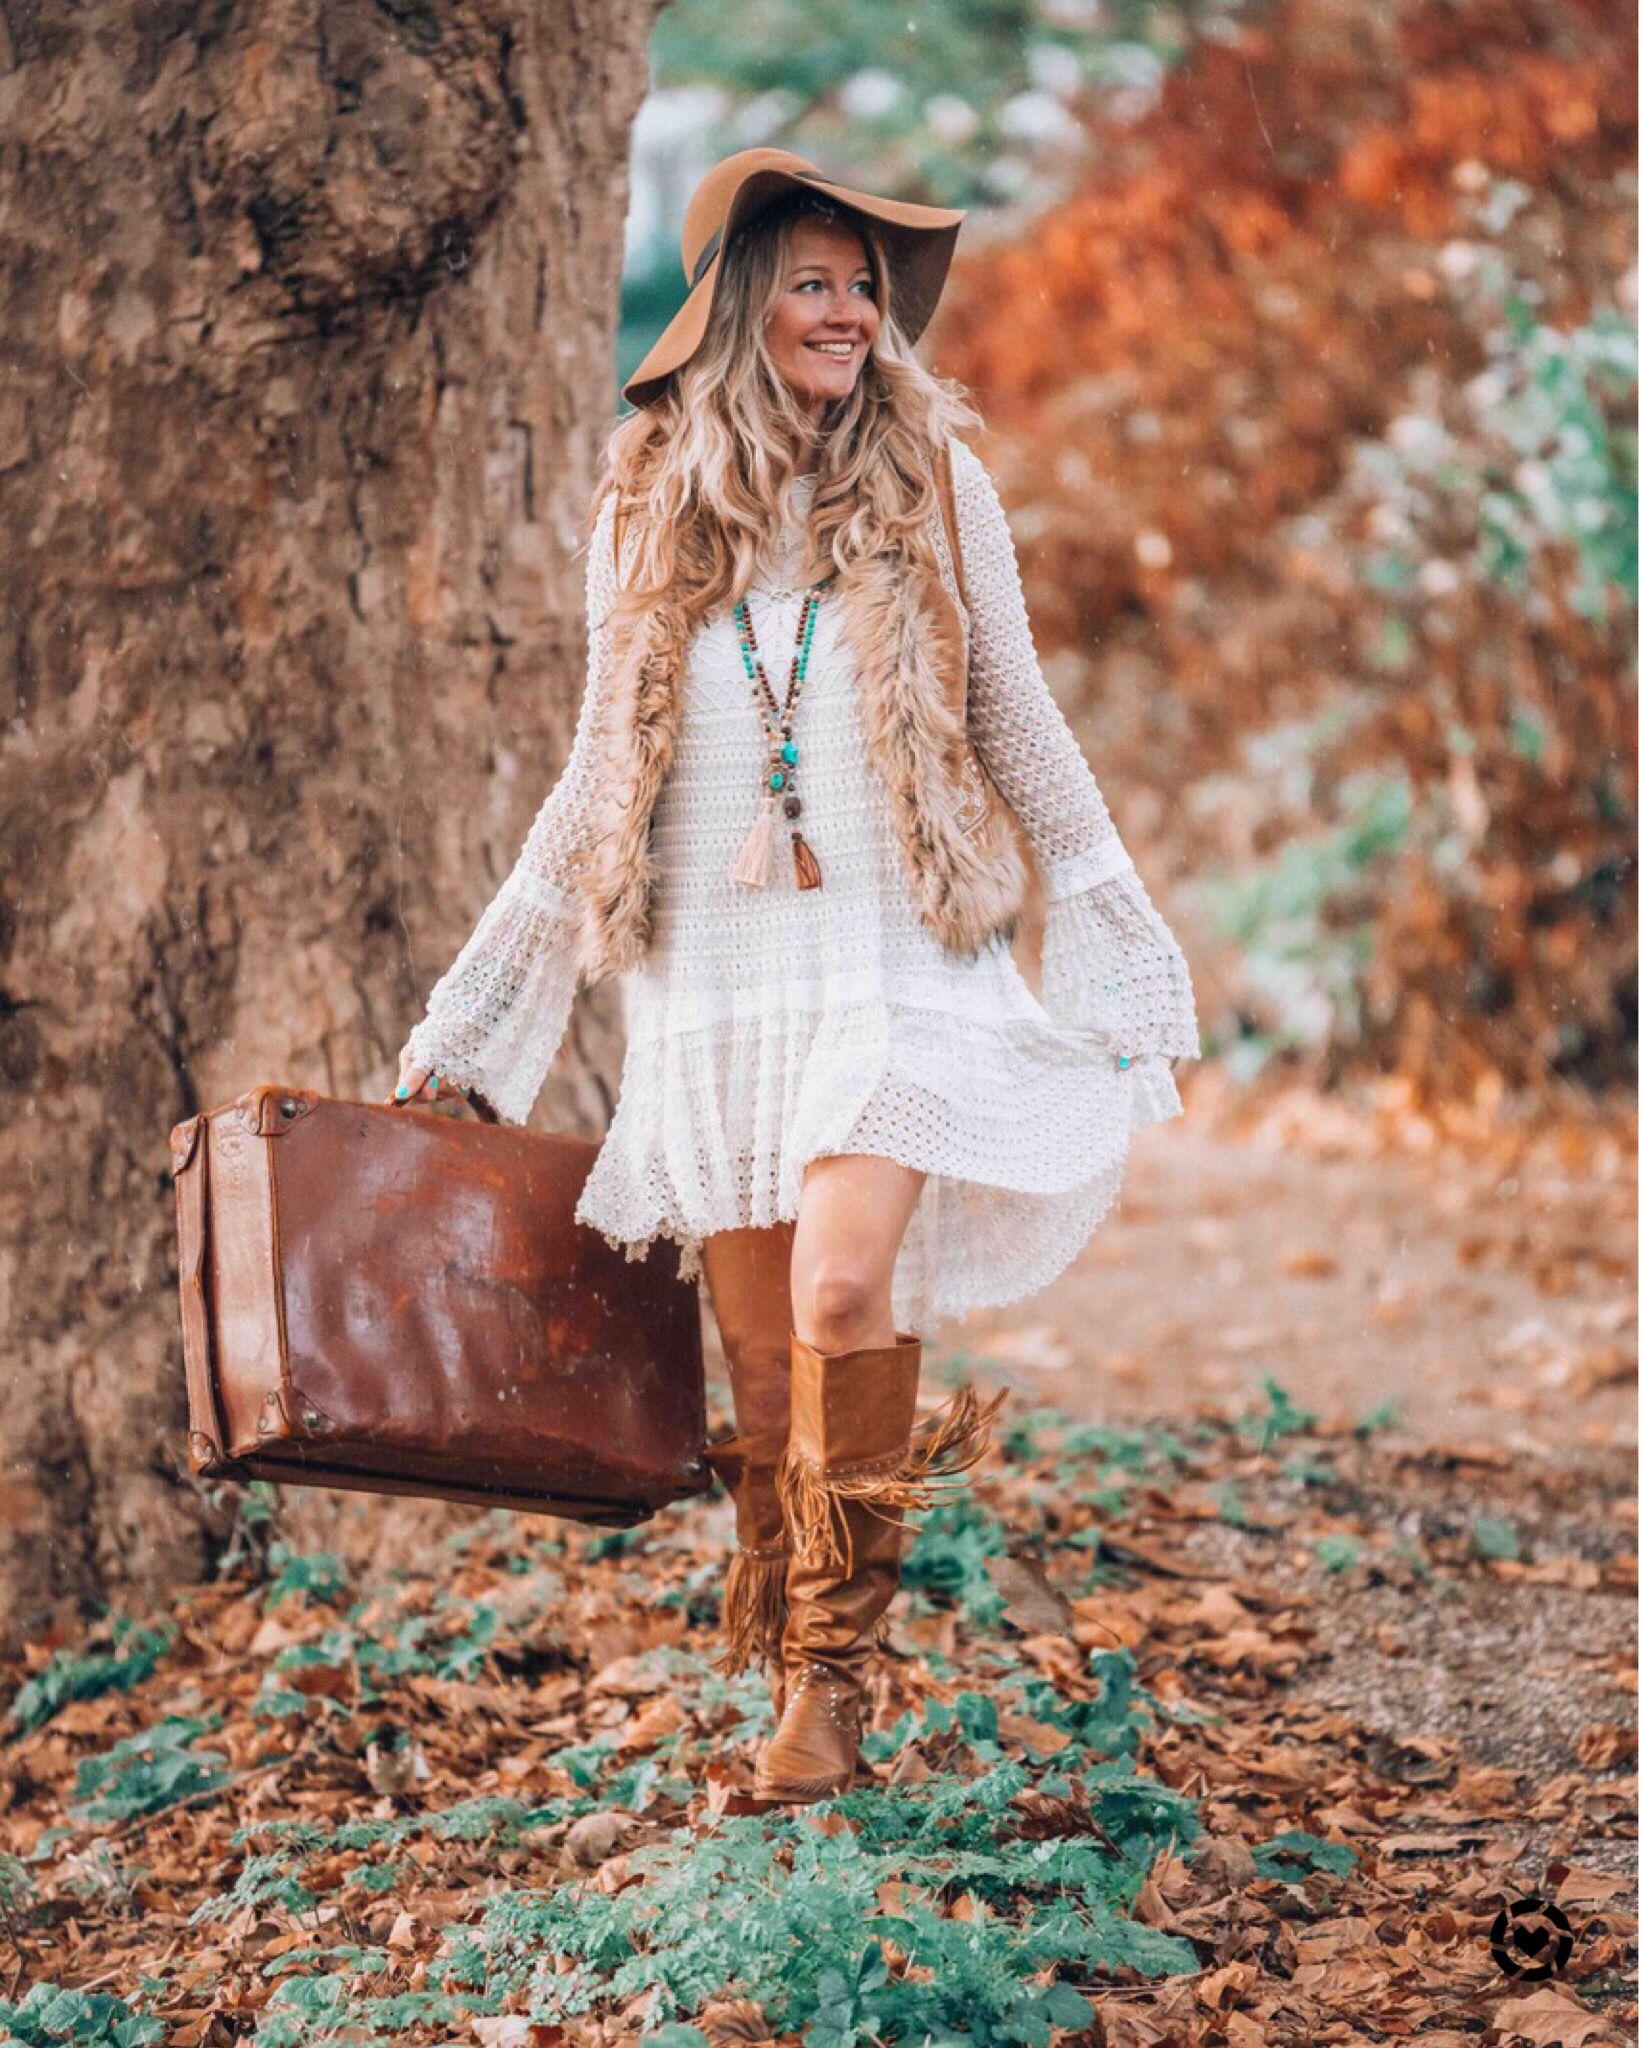 Bohemian Autumn Style Boho Chic Fashion Bohemian Clothes Bohemian Style Clothing